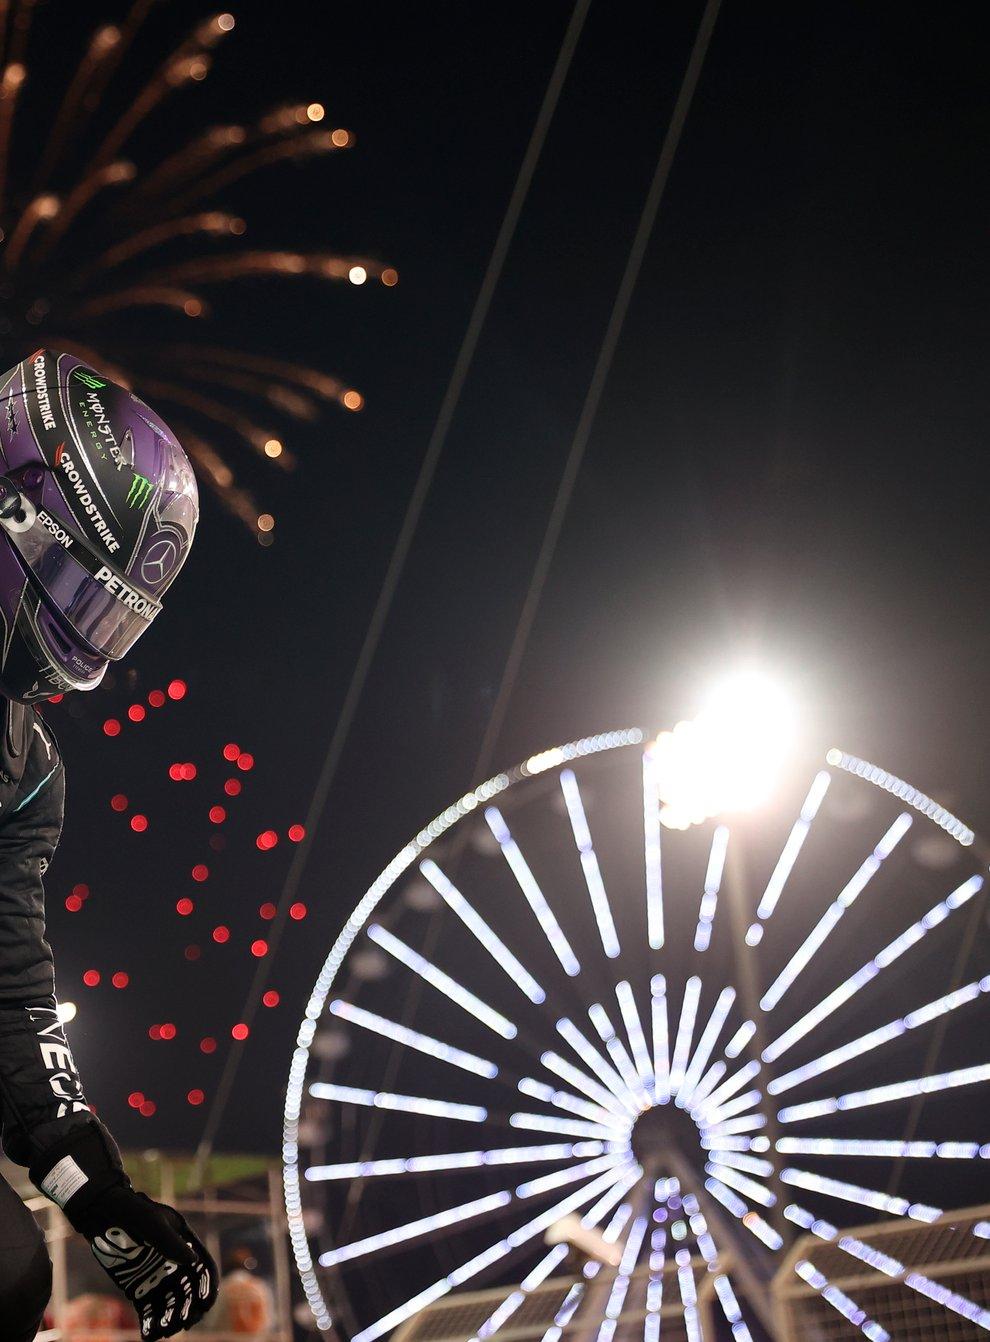 Mercedes driver Lewis Hamilton celebrated victory at the Bahrain Grand Prix